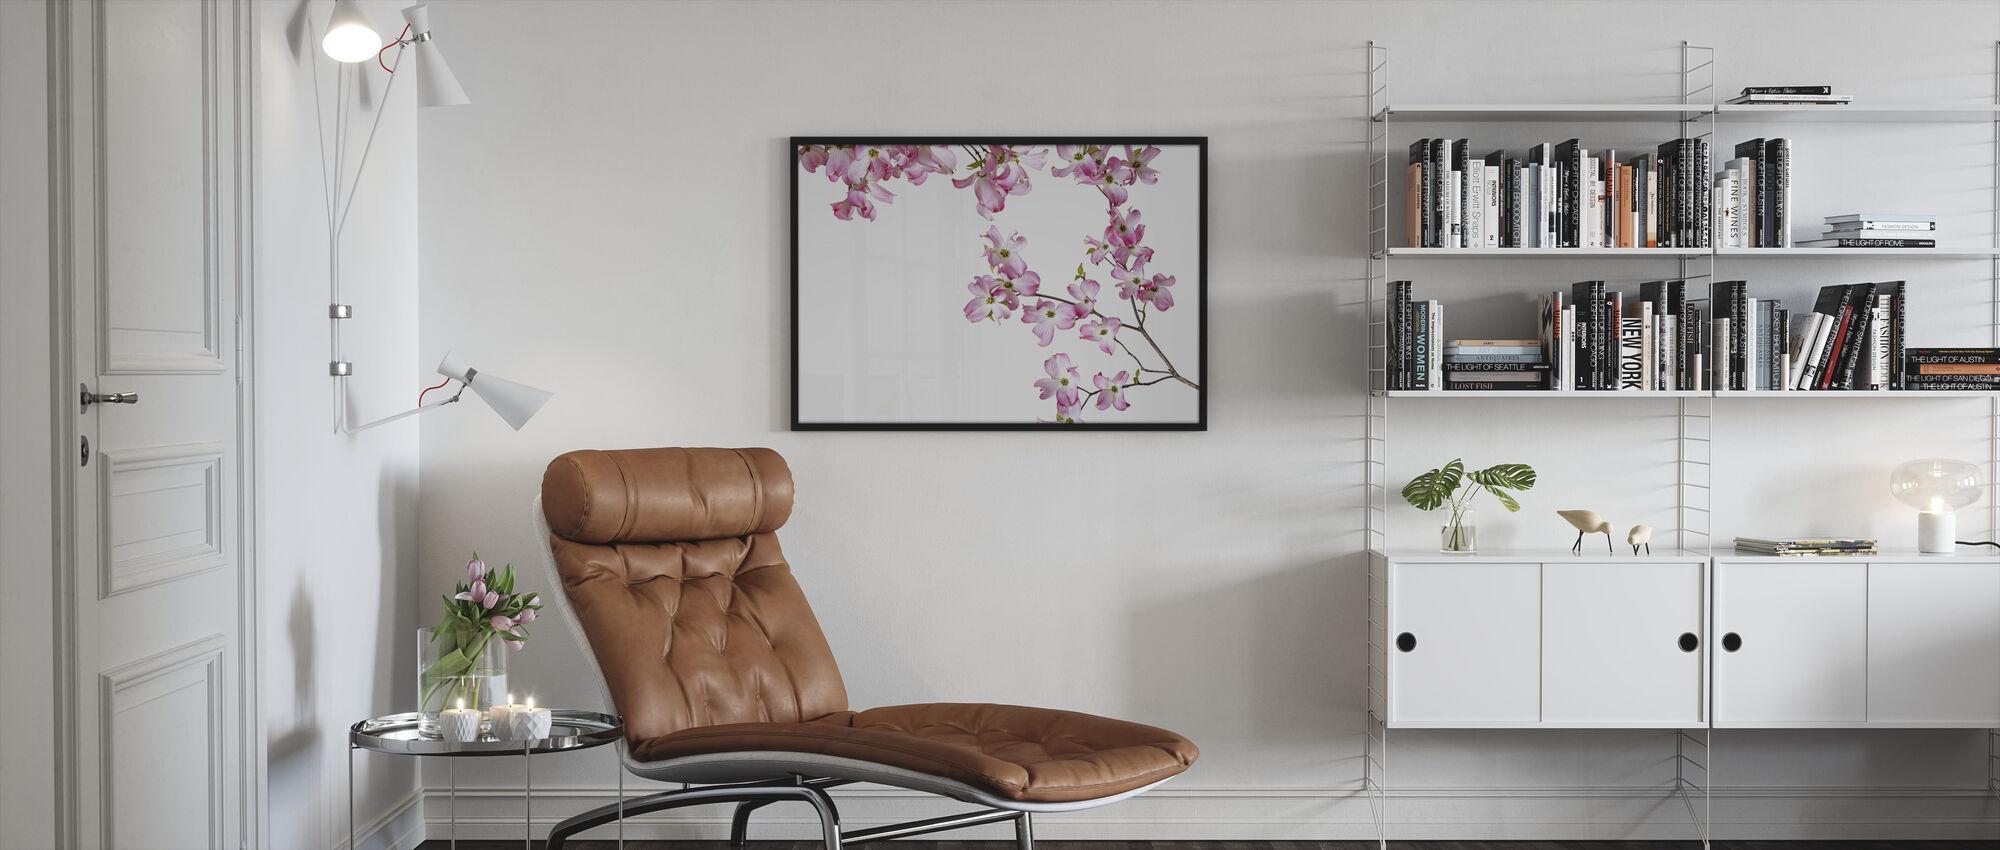 Striped Orchid - Framed print - Living Room